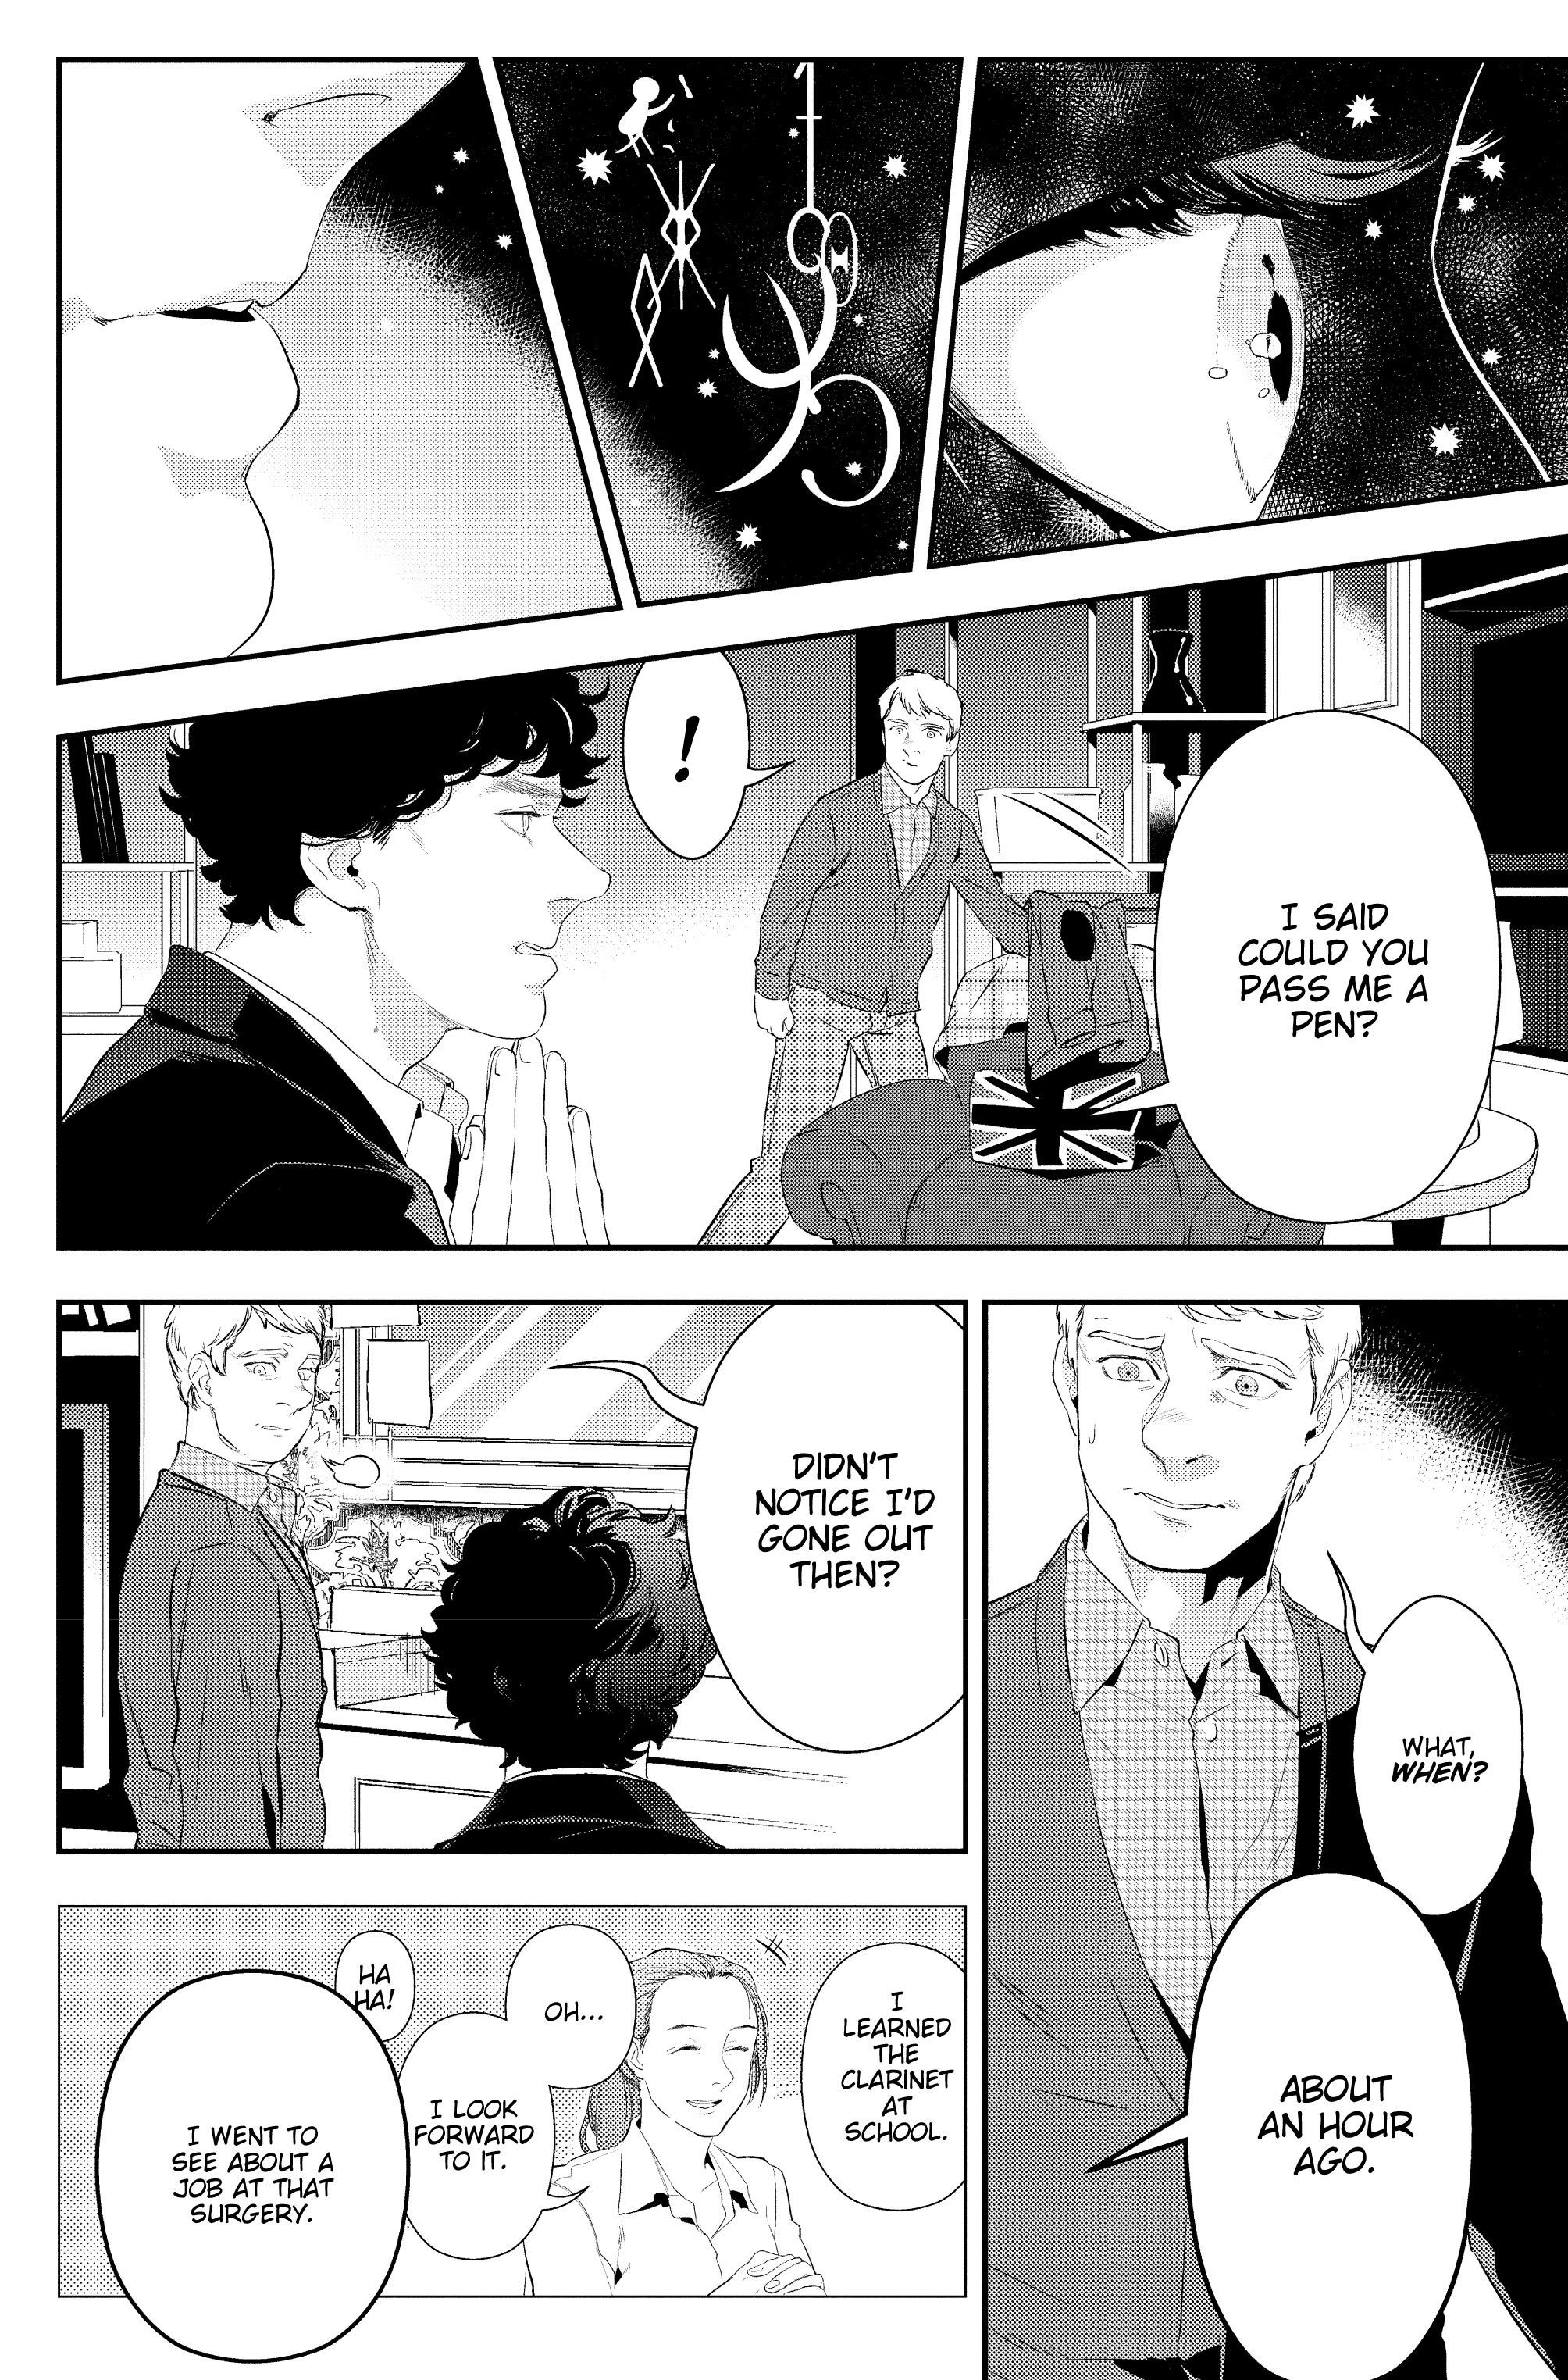 Read online Sherlock: The Blind Banker comic -  Issue #2 - 27